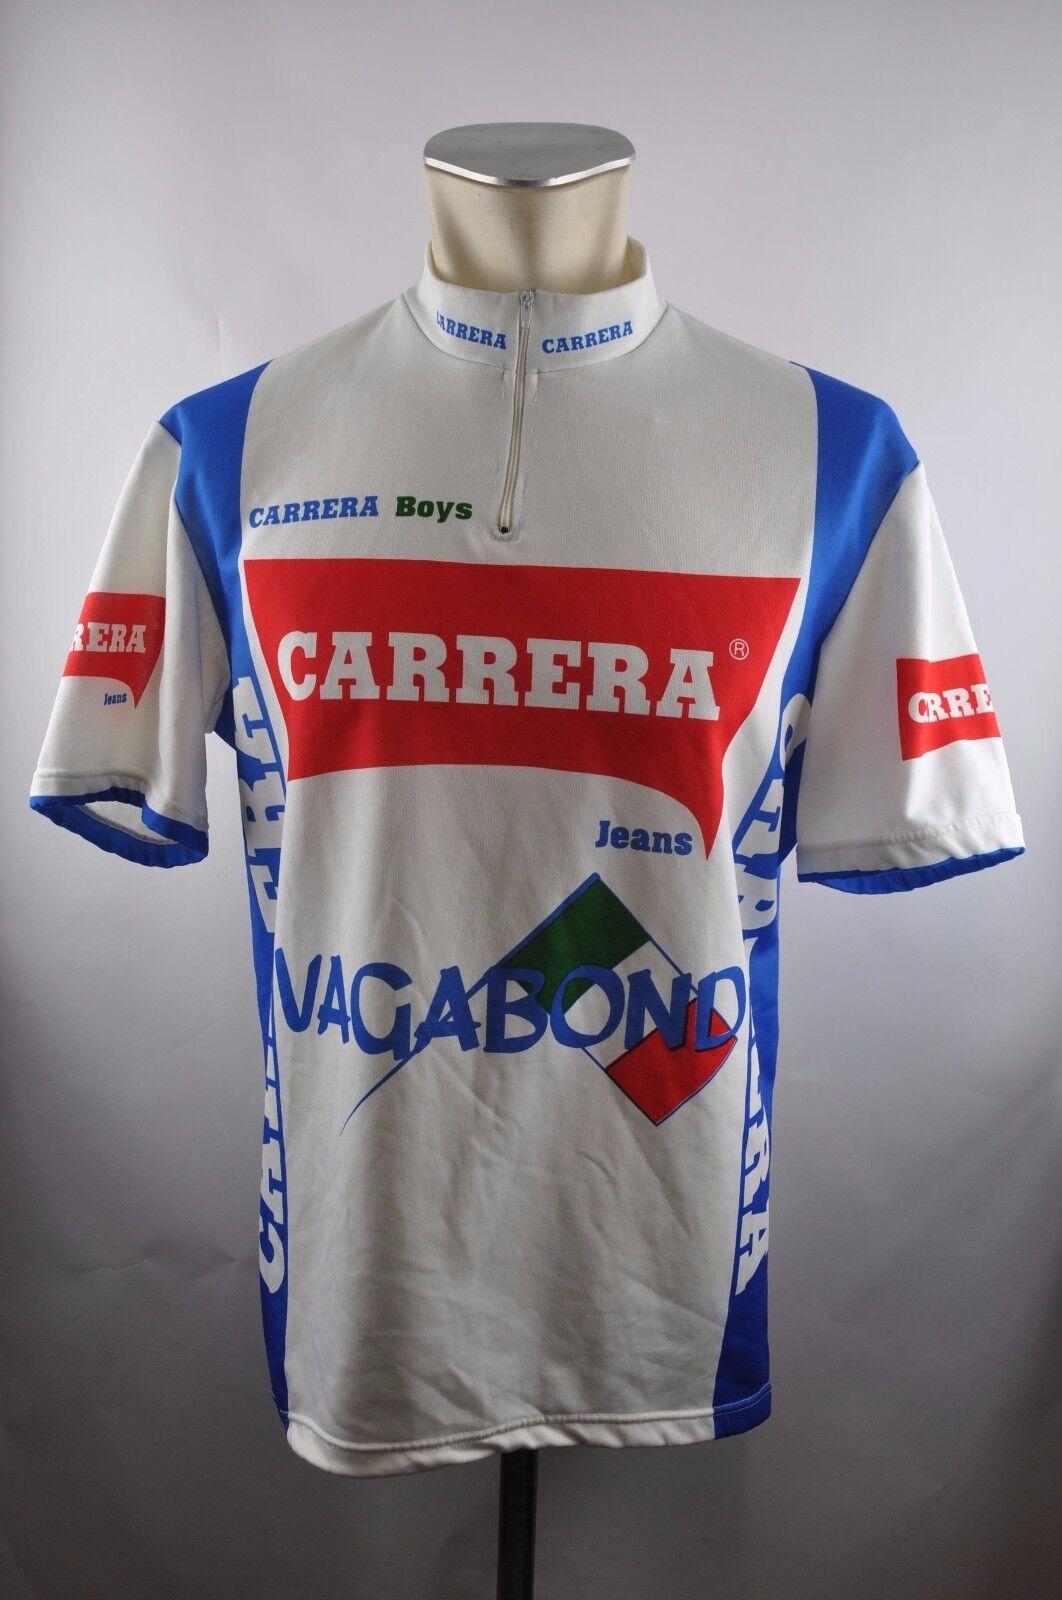 Carrera boys vagabond vintage cycling jersey Bike Rad Trikot Gr. 6 57cm U5